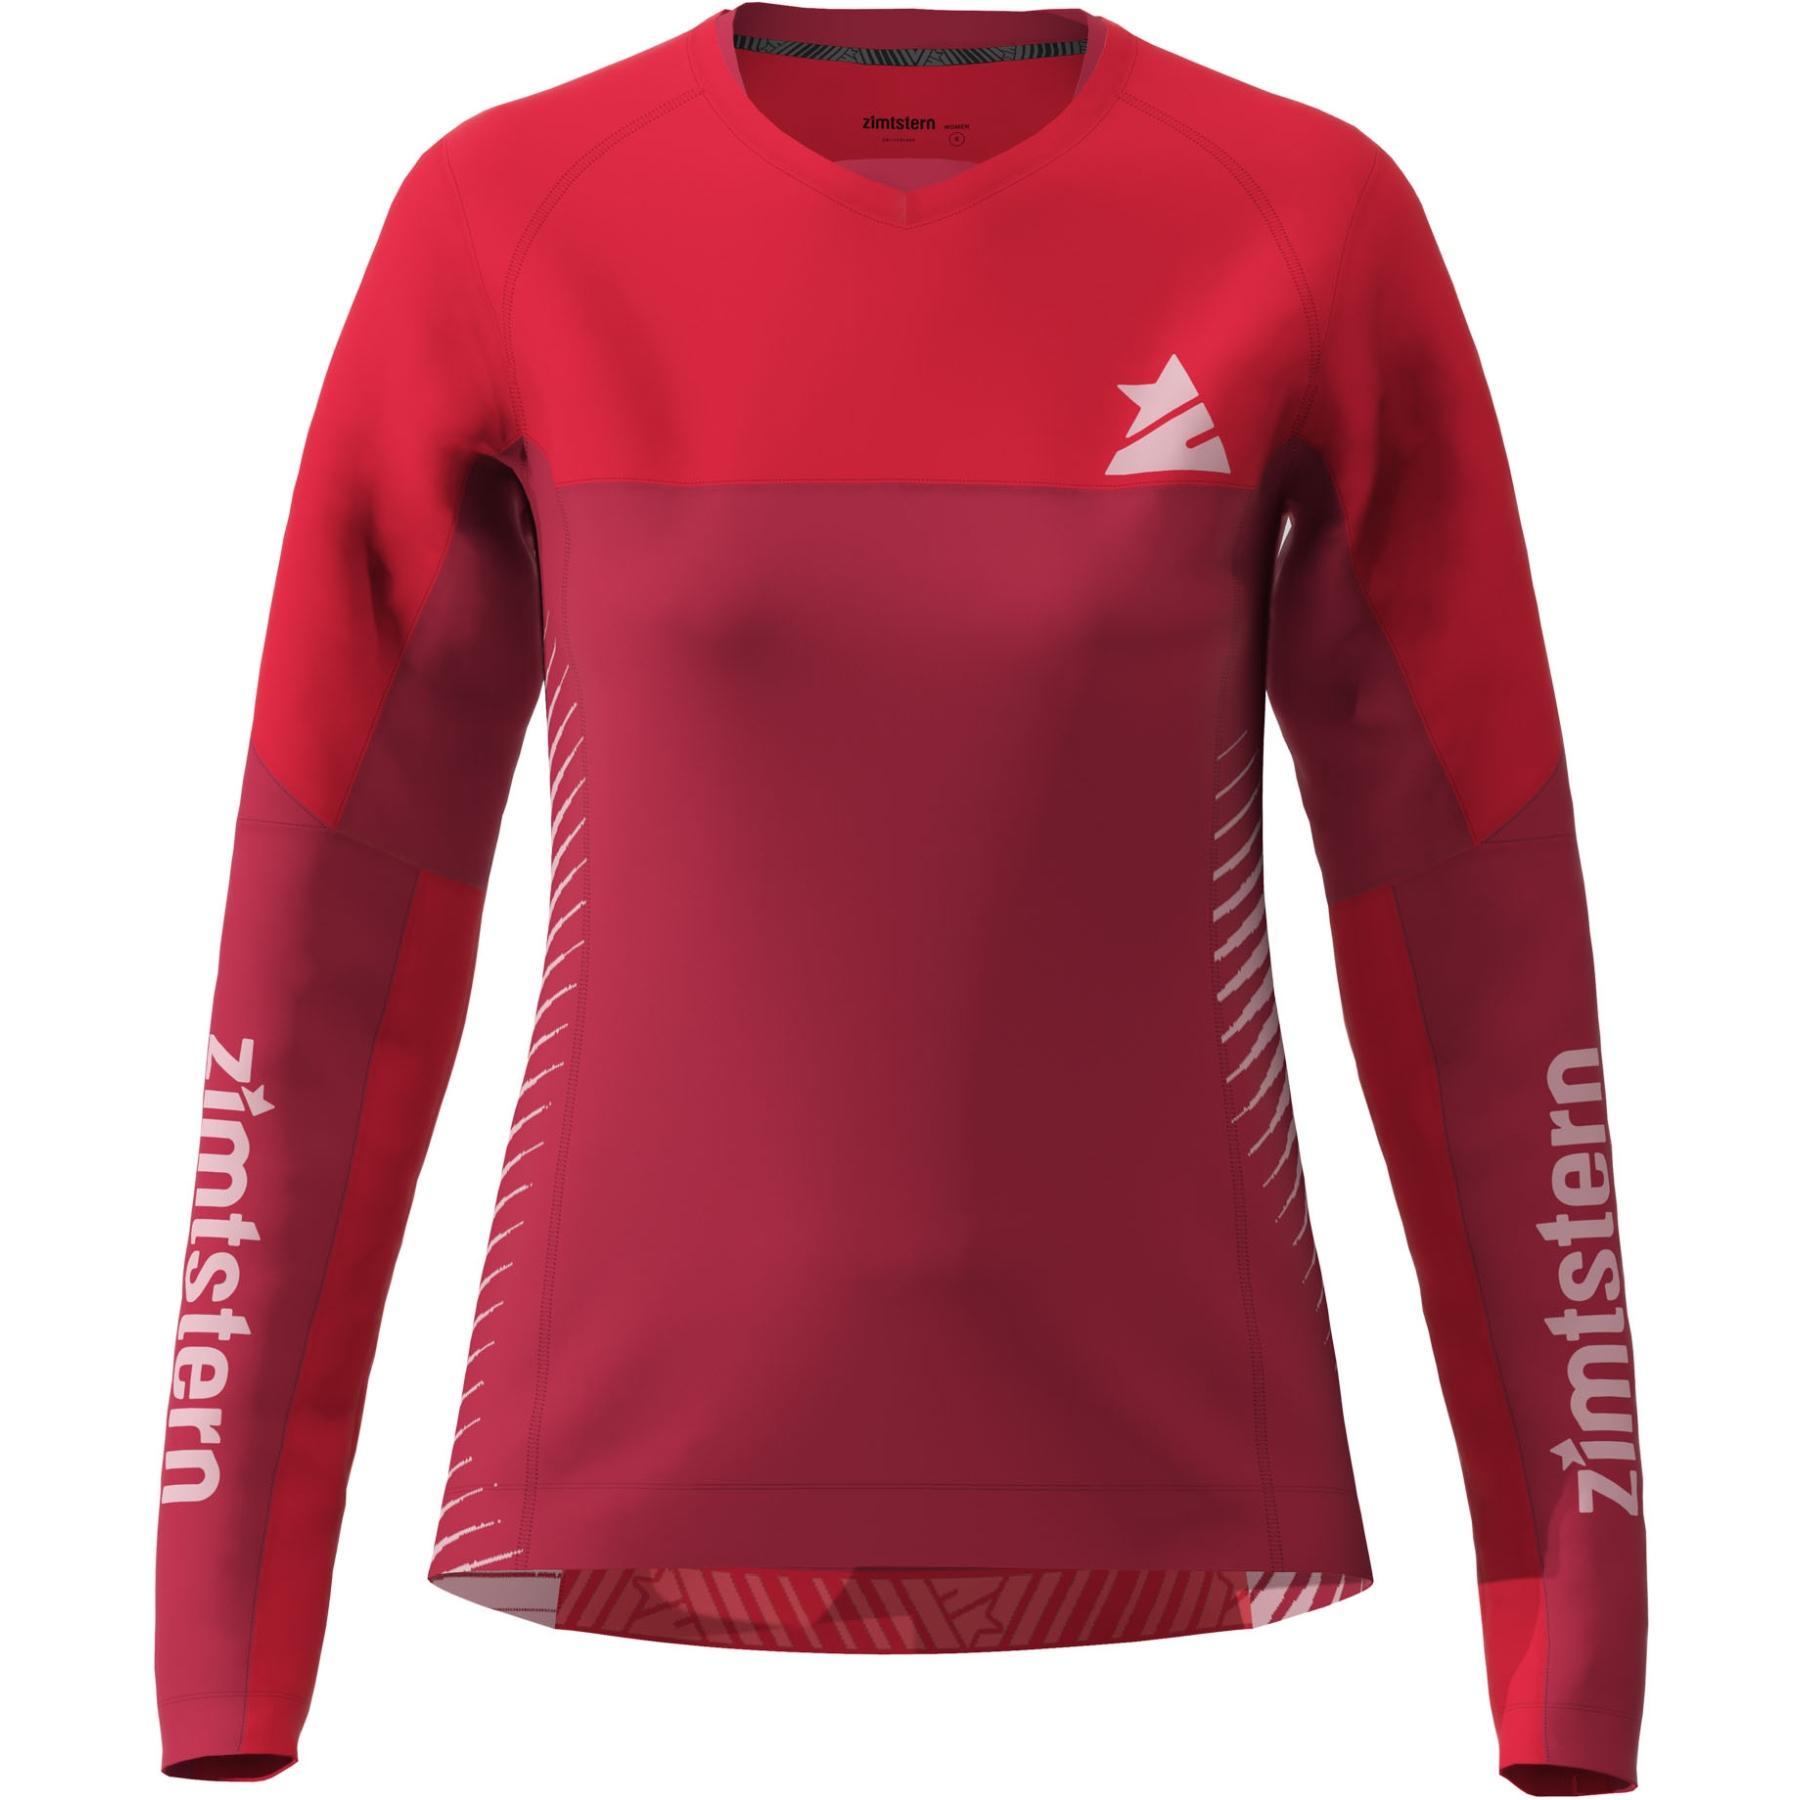 Zimtstern Bulletz Langarm-Shirt Damen - jester red/cyber red